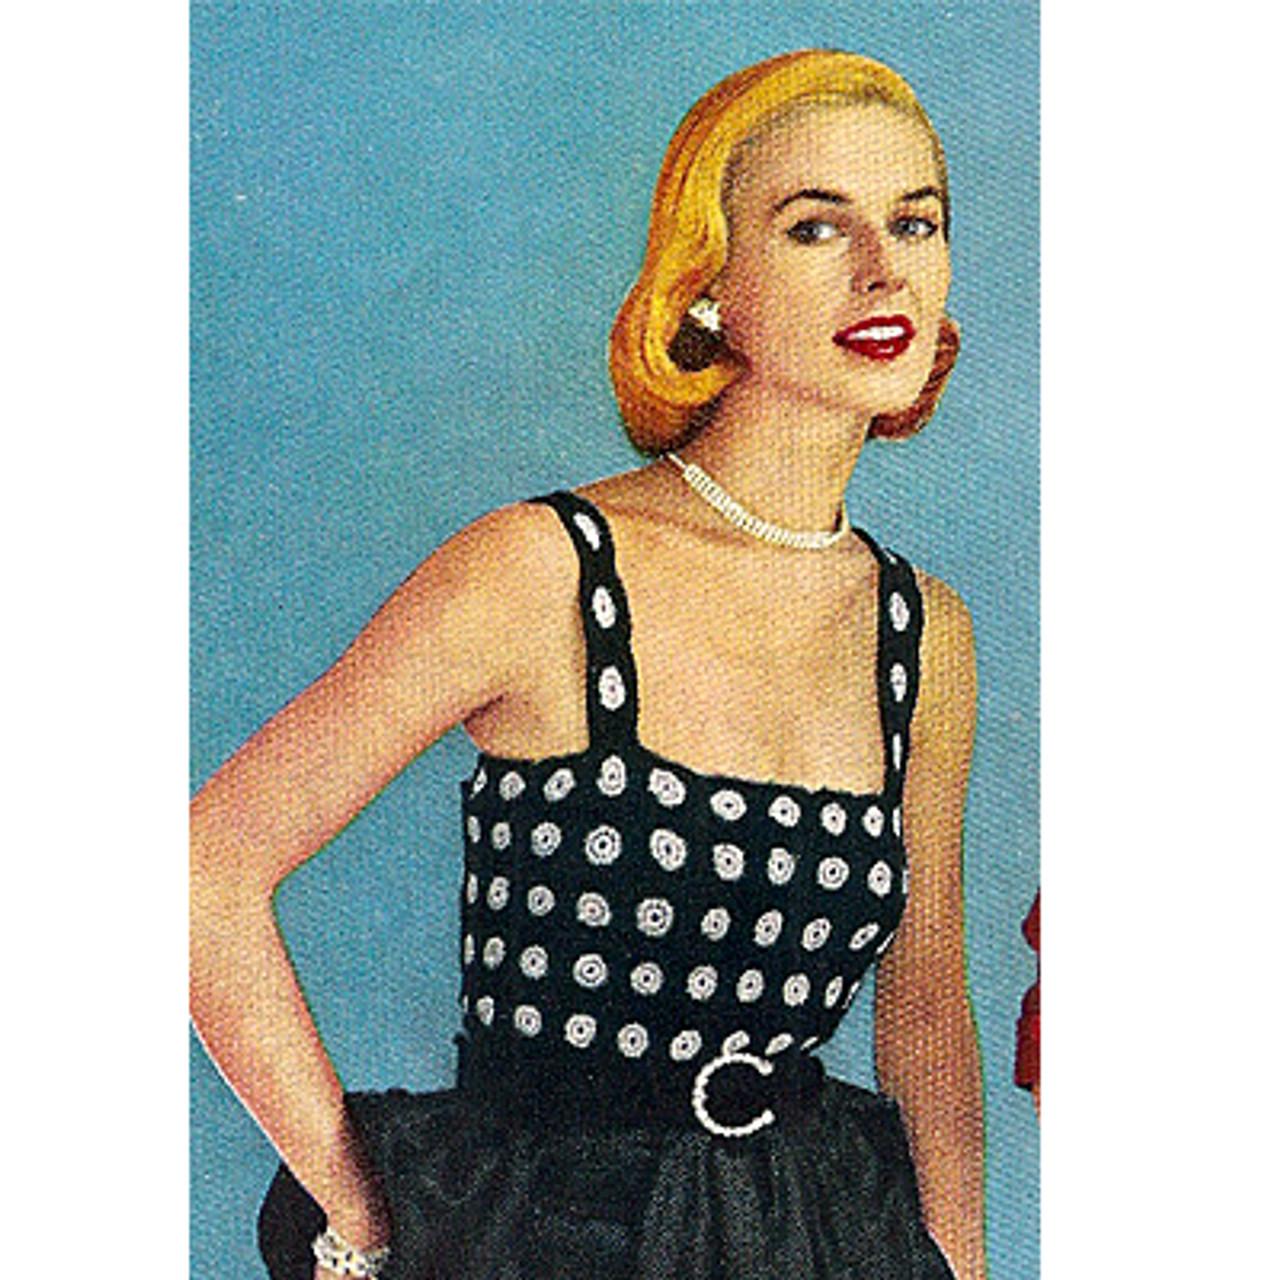 Crochet Medallion Top Pattern with Shoulder Straps